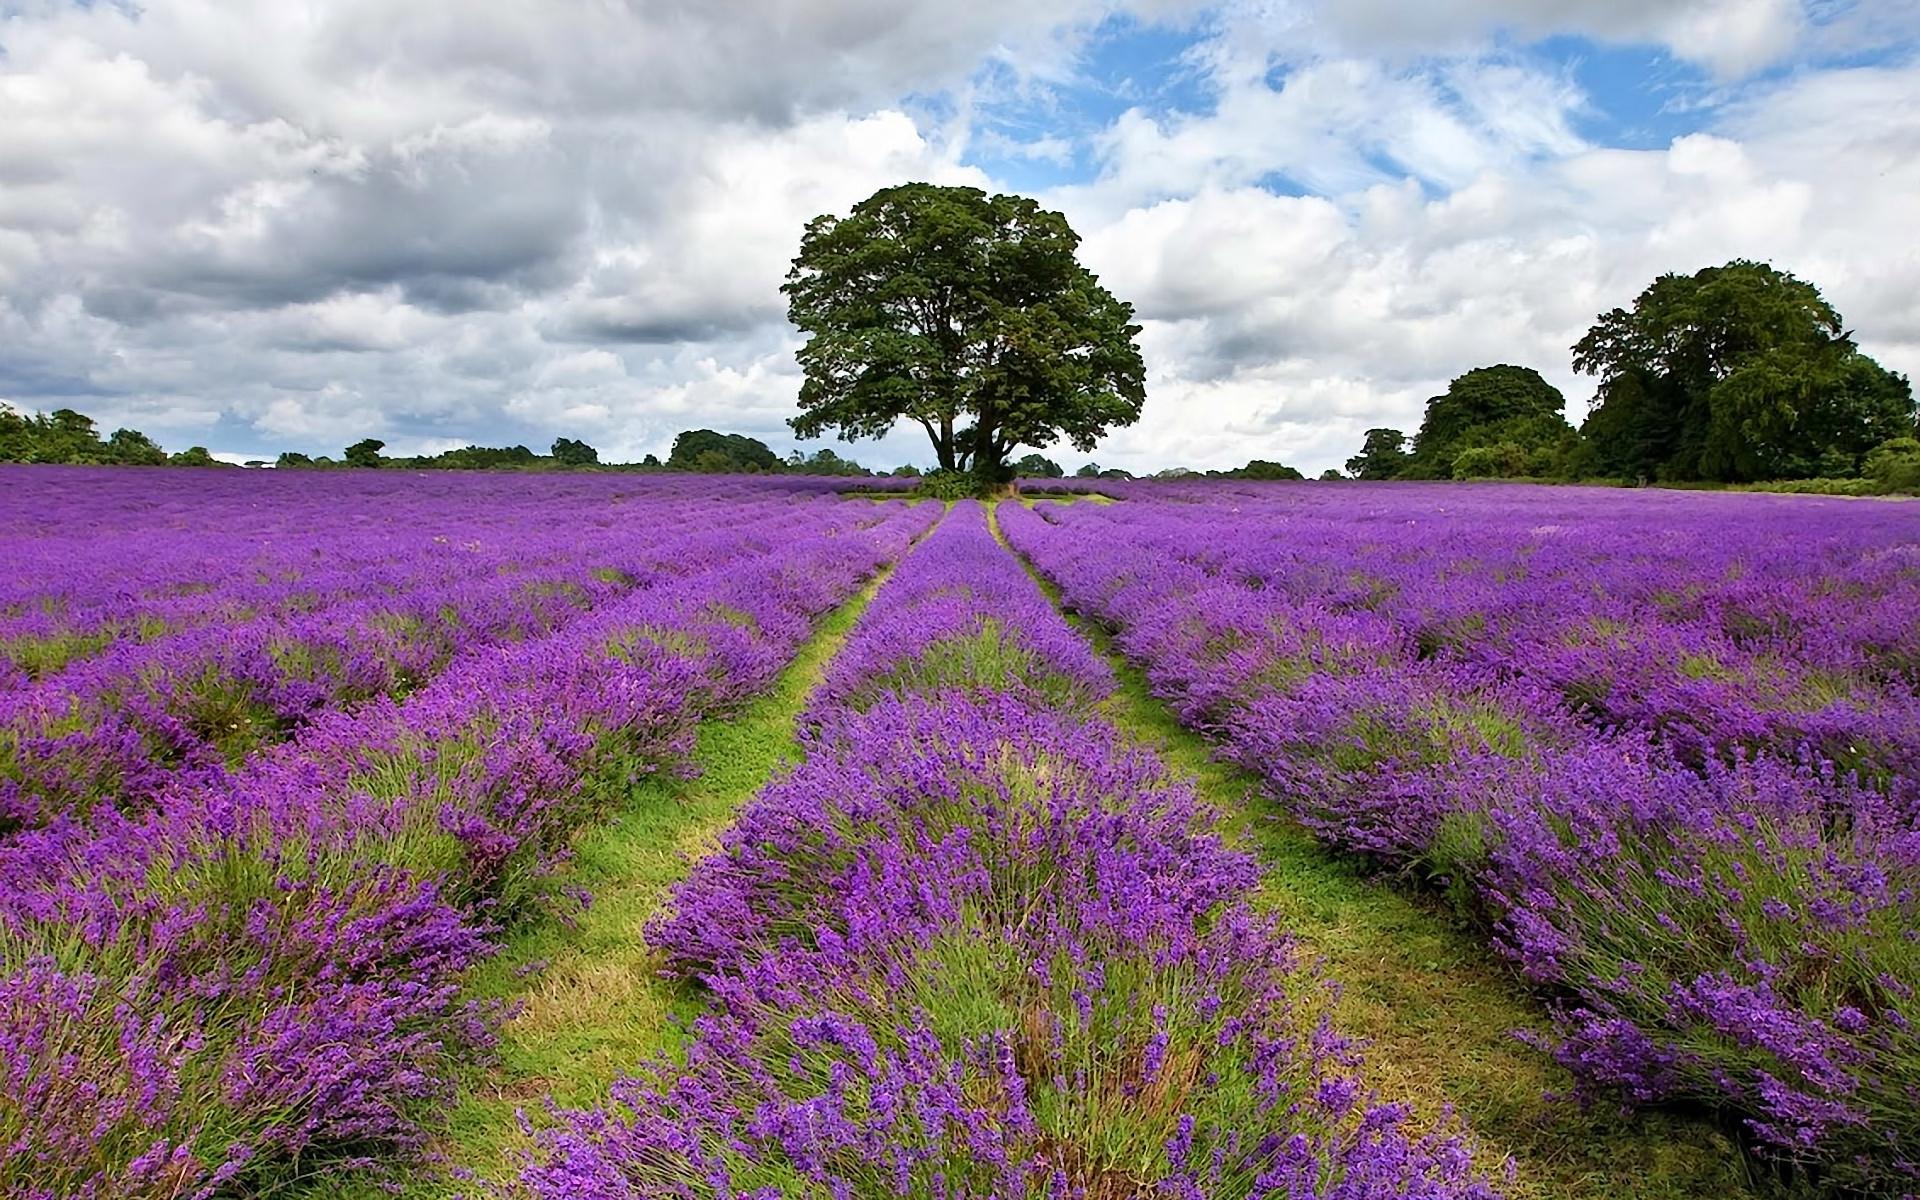 Lavender field wallpaper 1920x1200